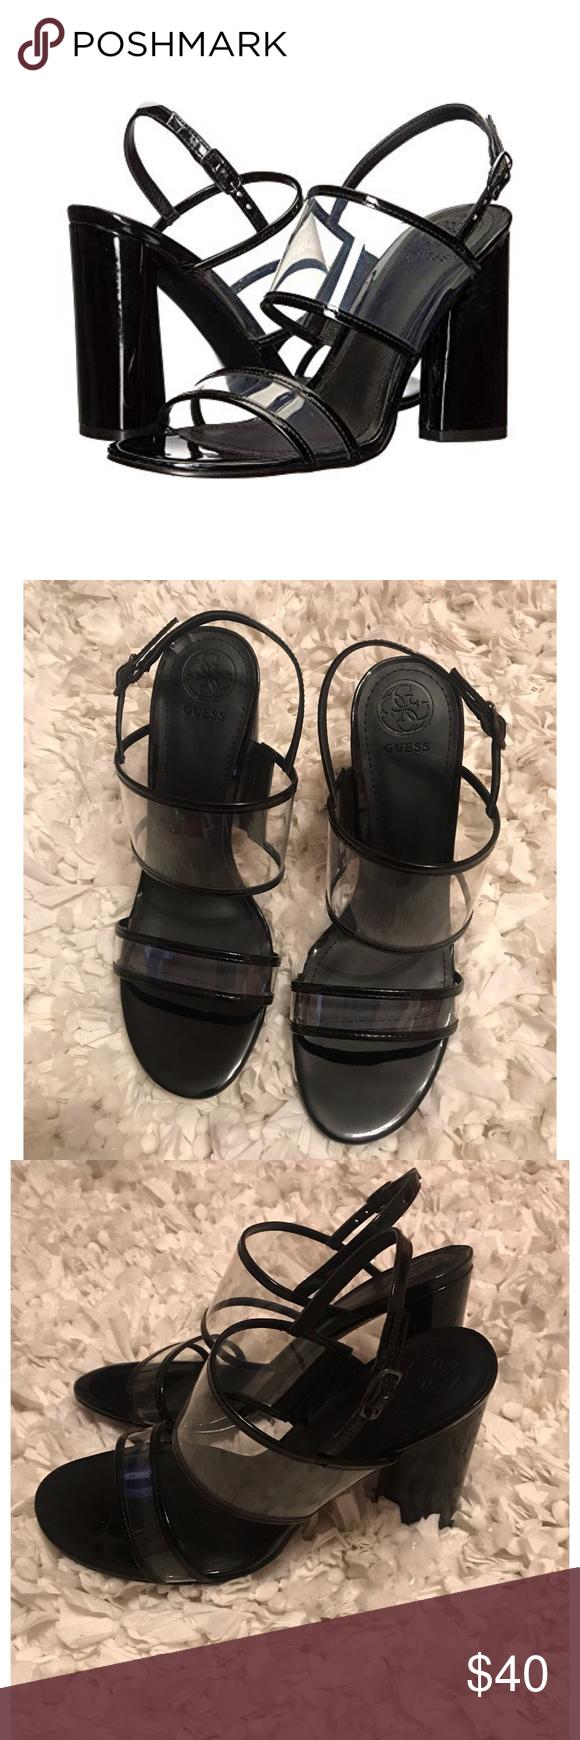 NEW Guess Amidala Heels * Manmade upper materials